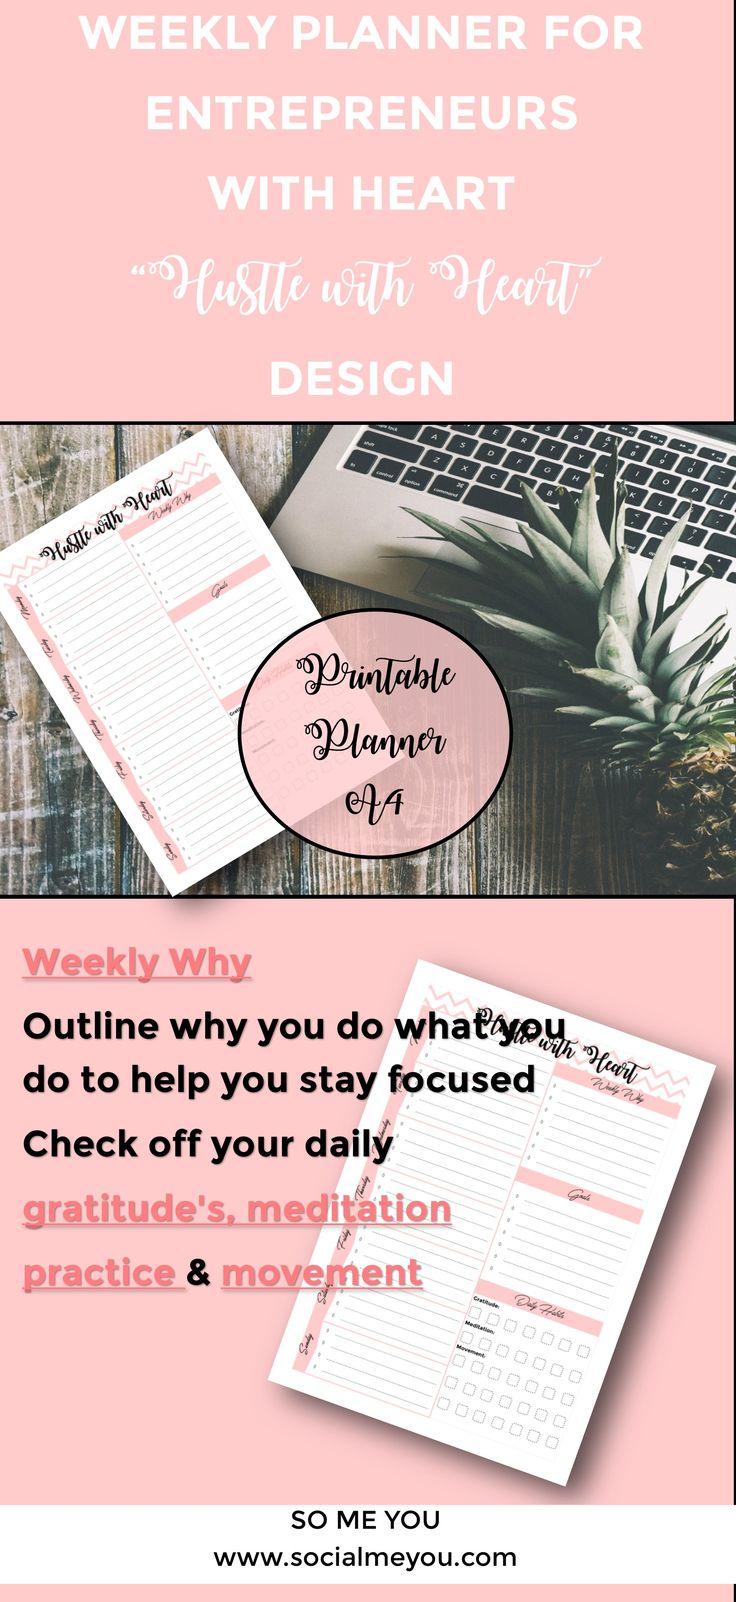 Weekly Planner Printable, Entrepreneur Weekly Planner, Printable Hustle with Heart Planner, Weekly Planner 2017, Set Goals, To Do List